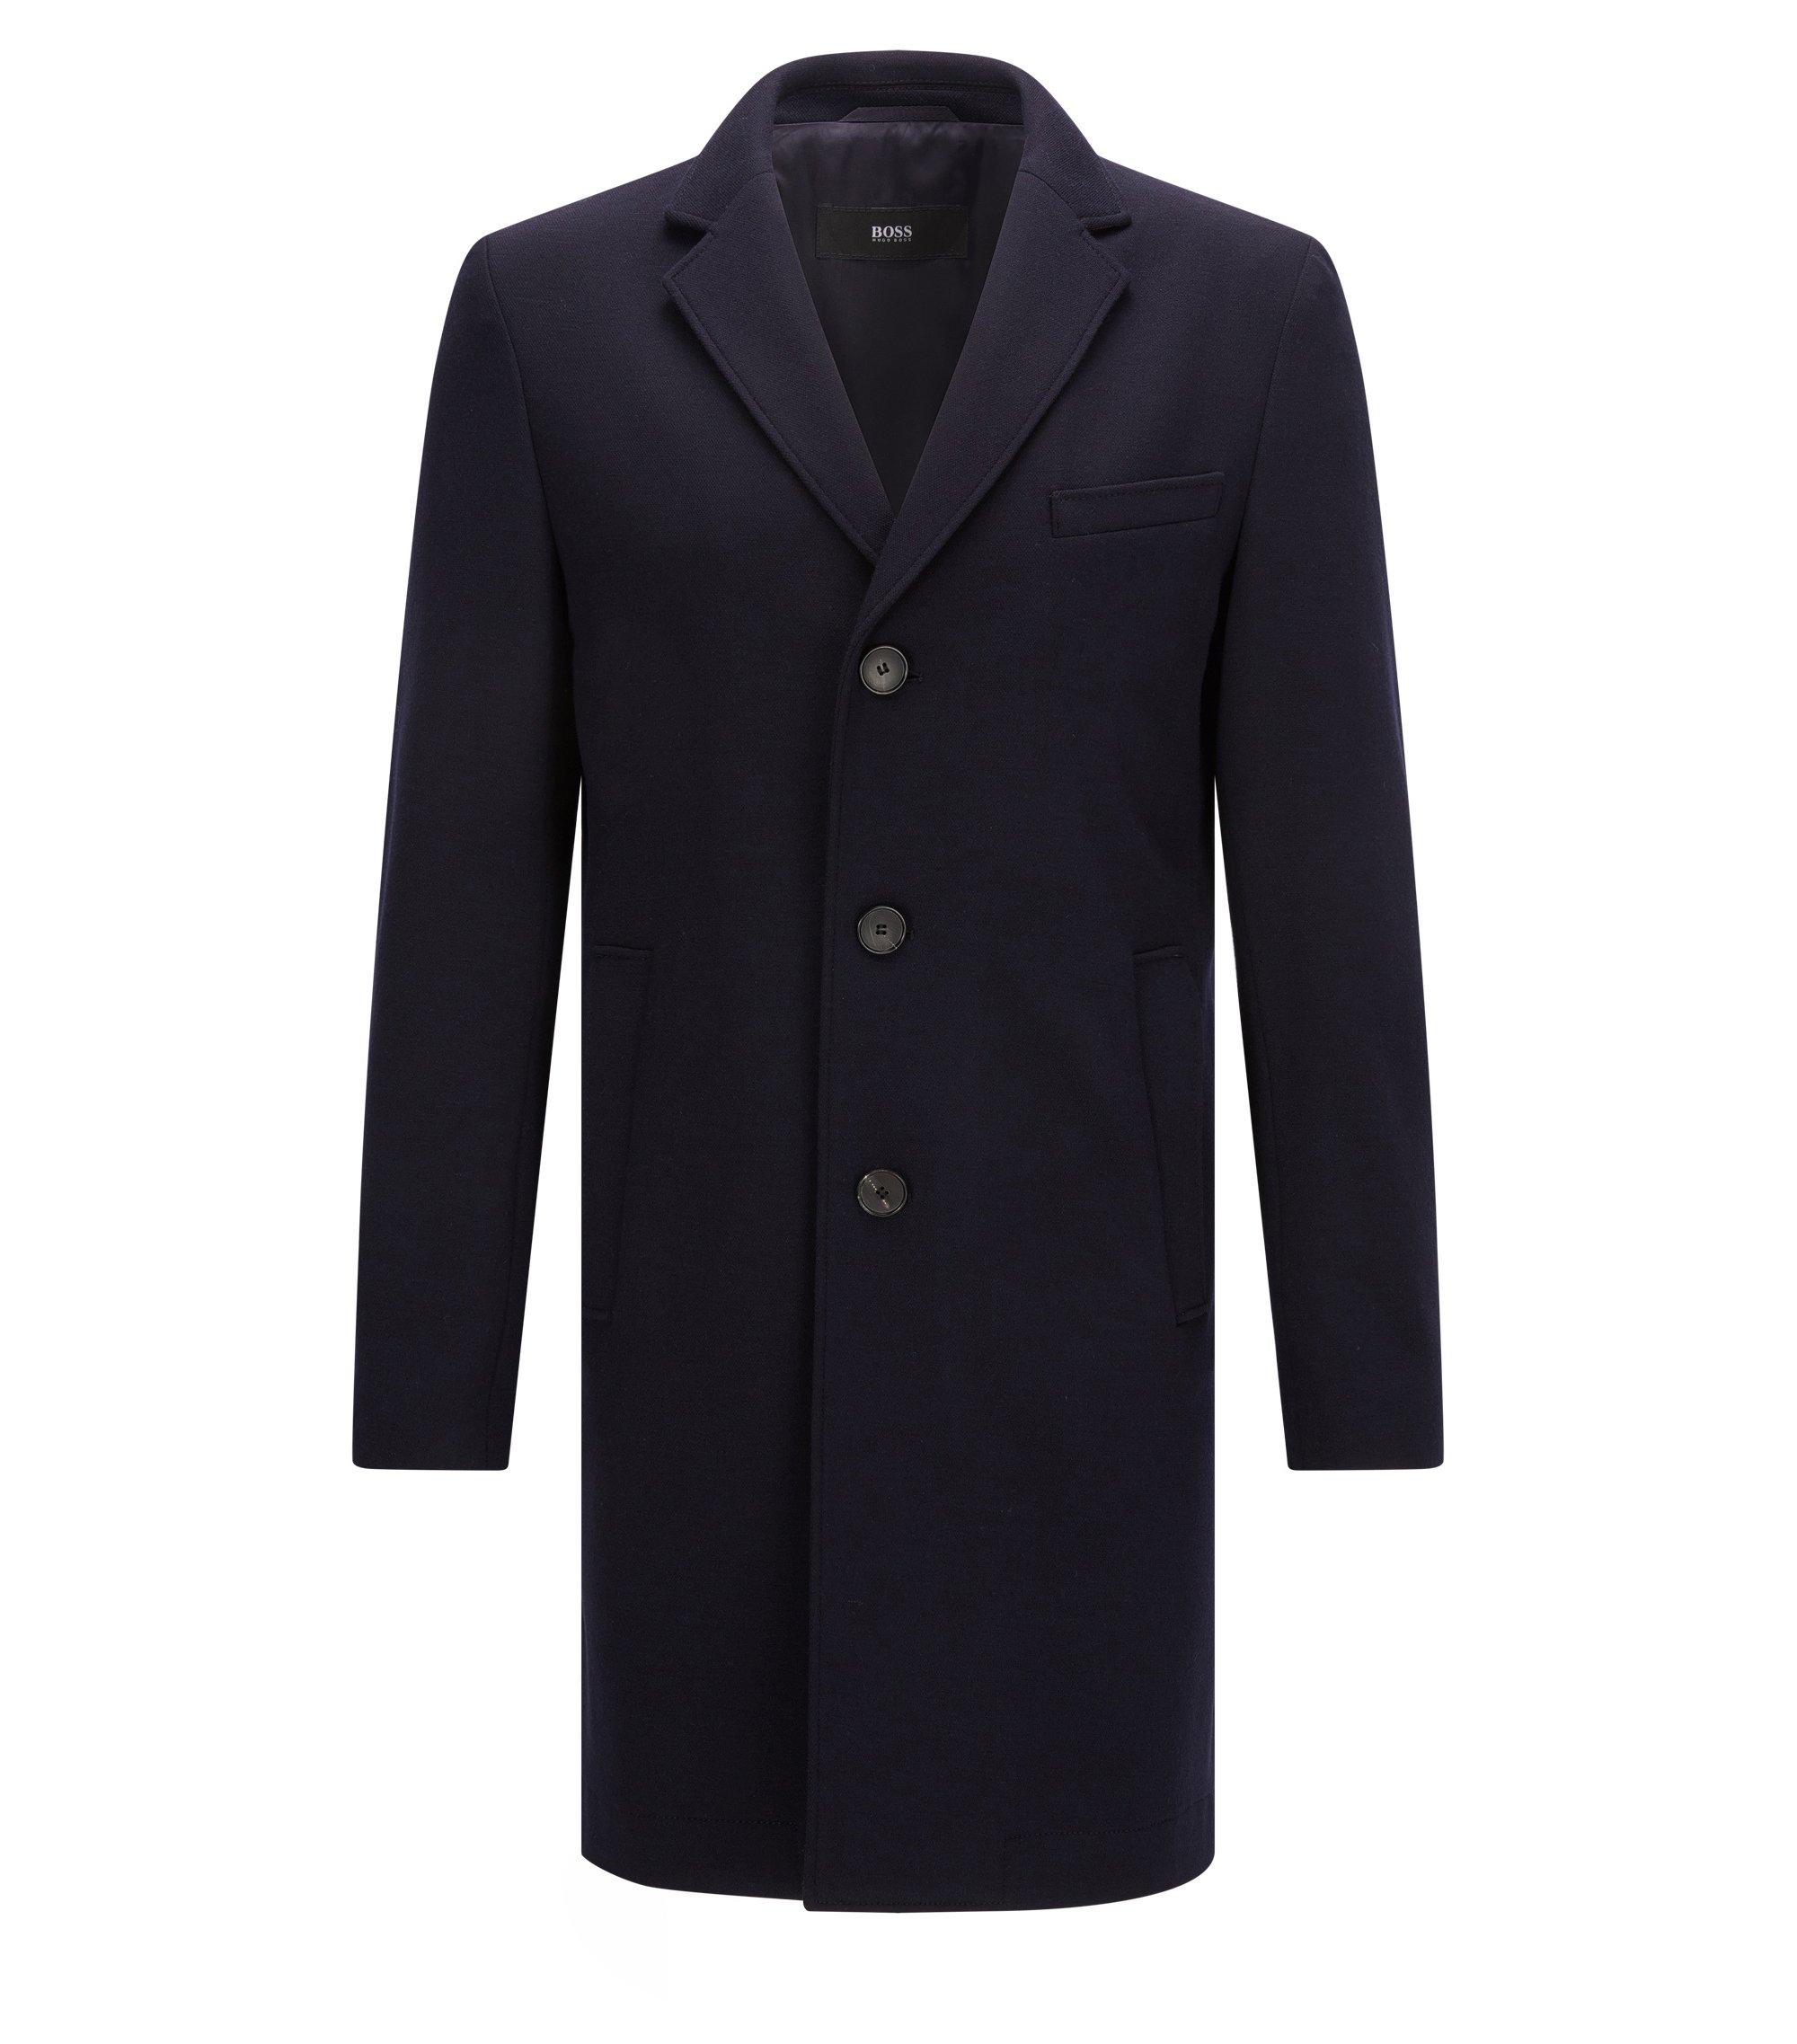 Manteau Slim Fit en jersey stretch, Bleu foncé